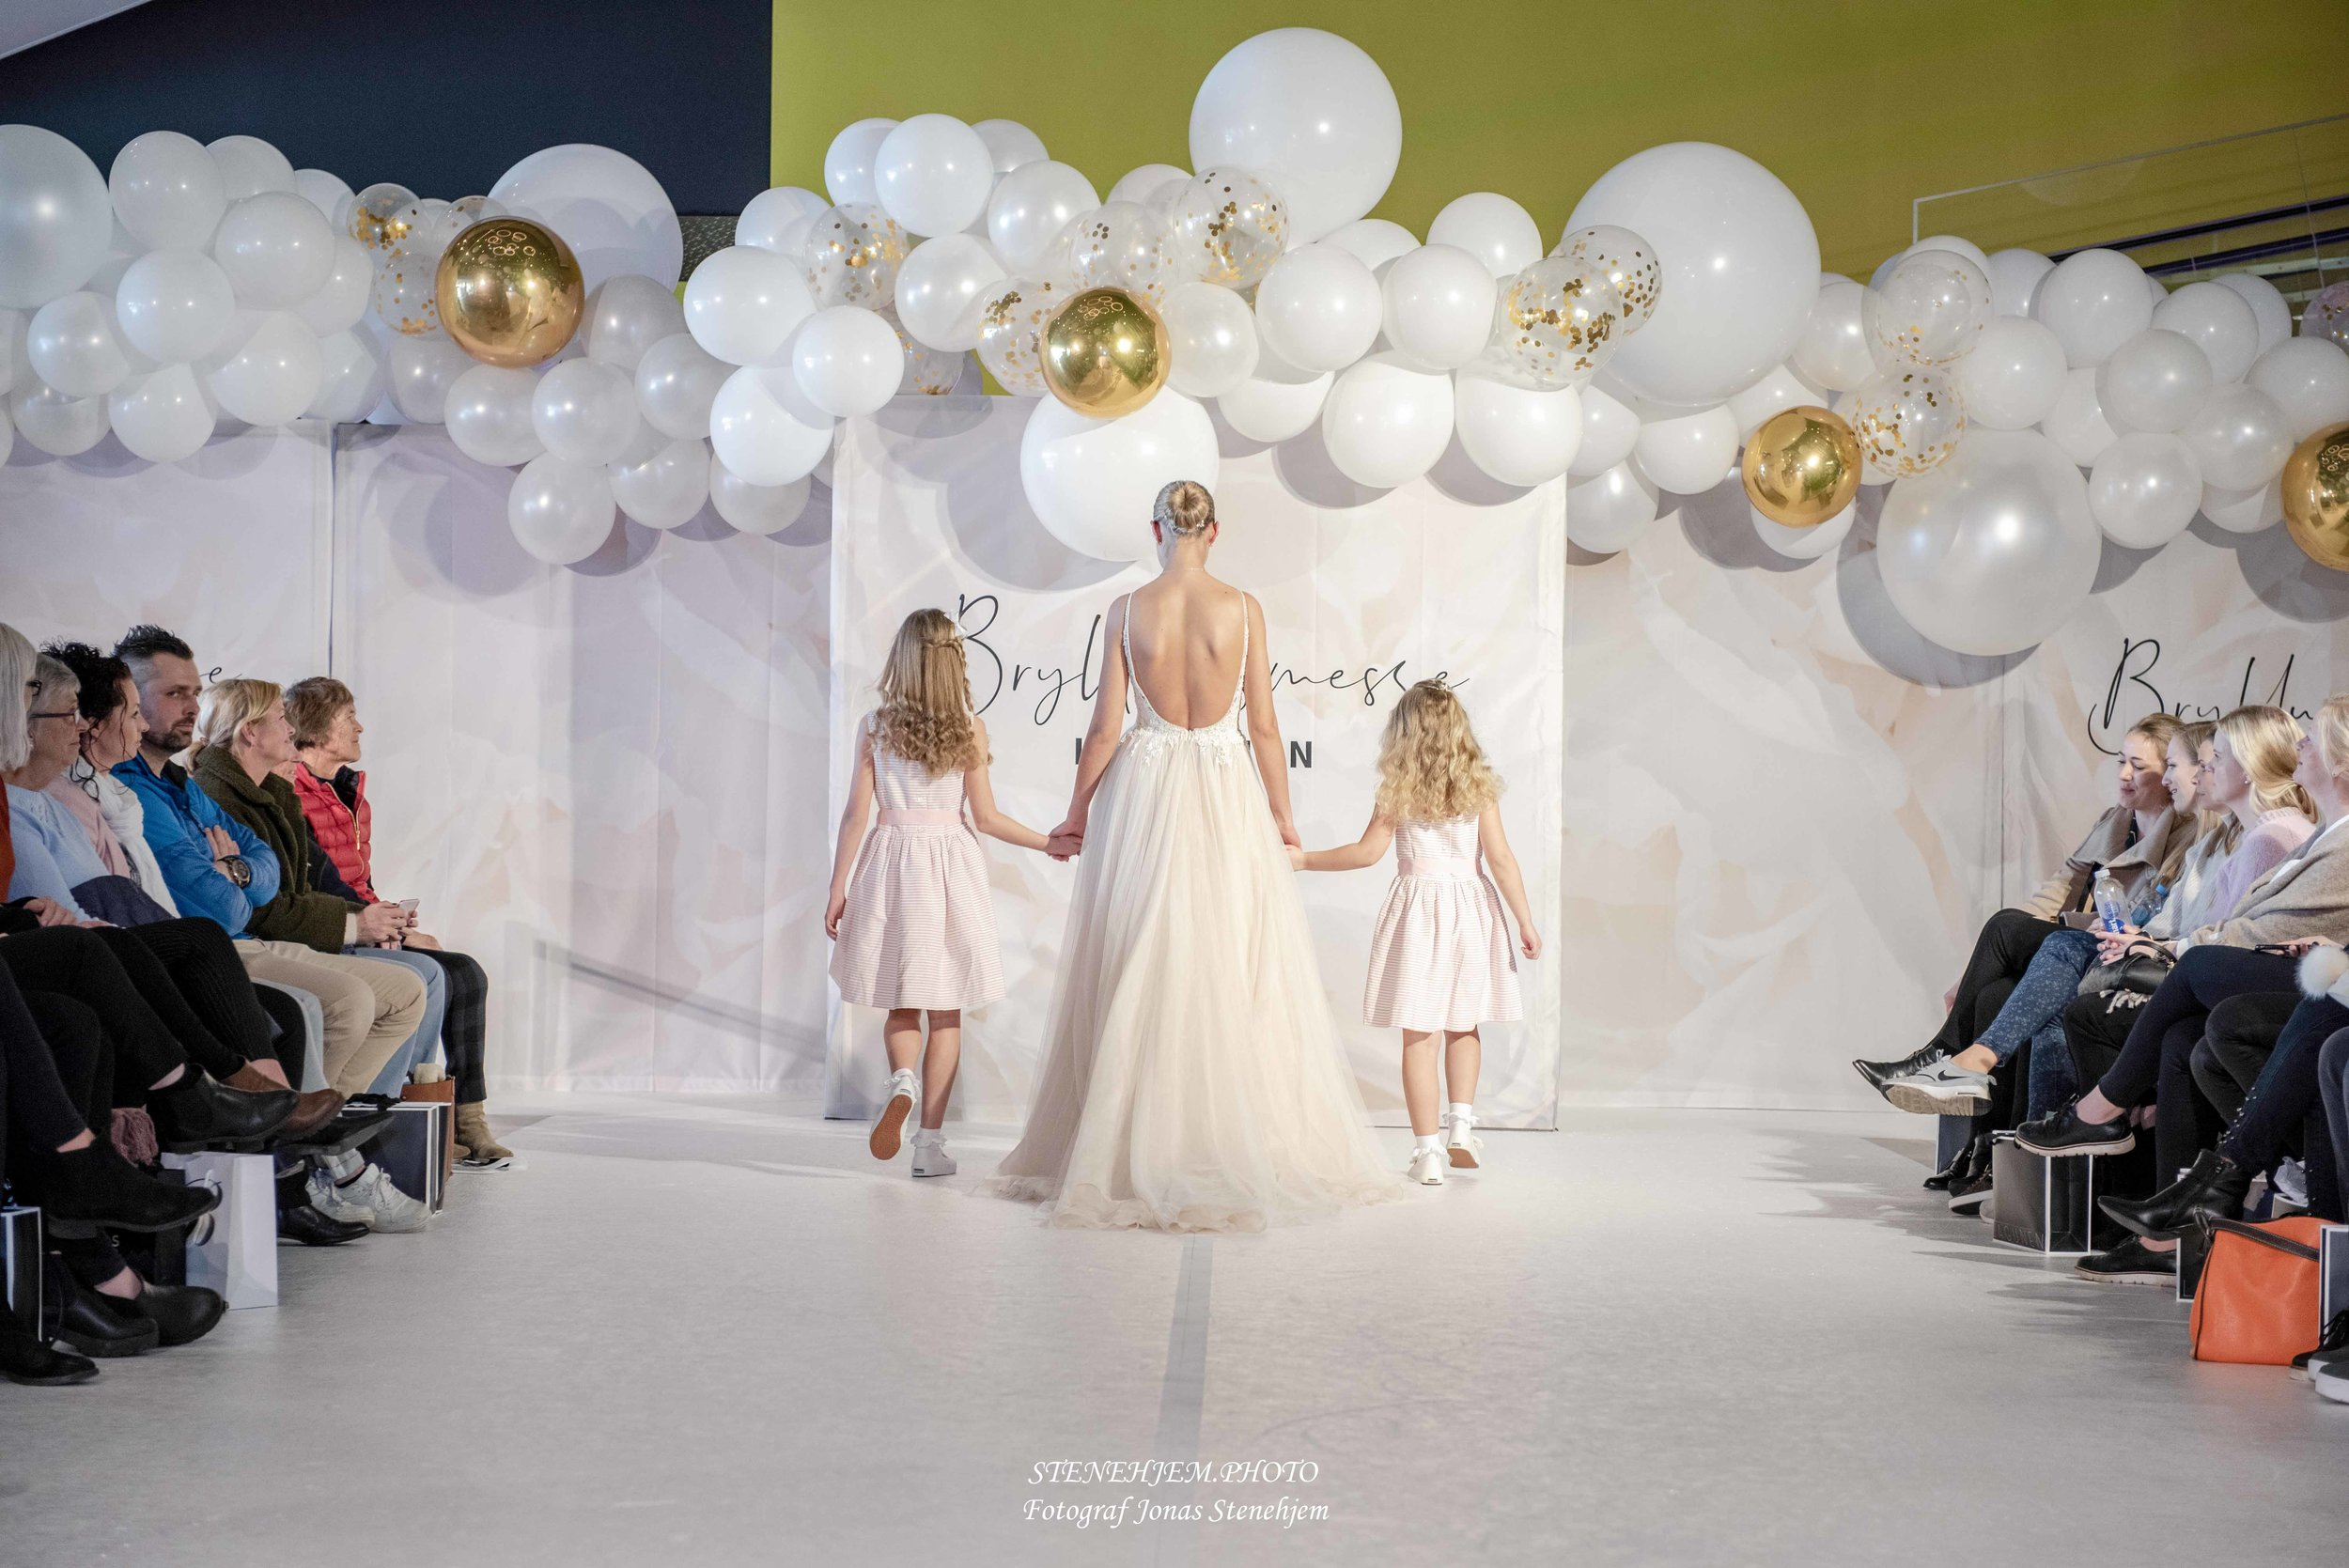 Bryllupsmesse_Lagunen_mittaltweddingfair__087.jpg